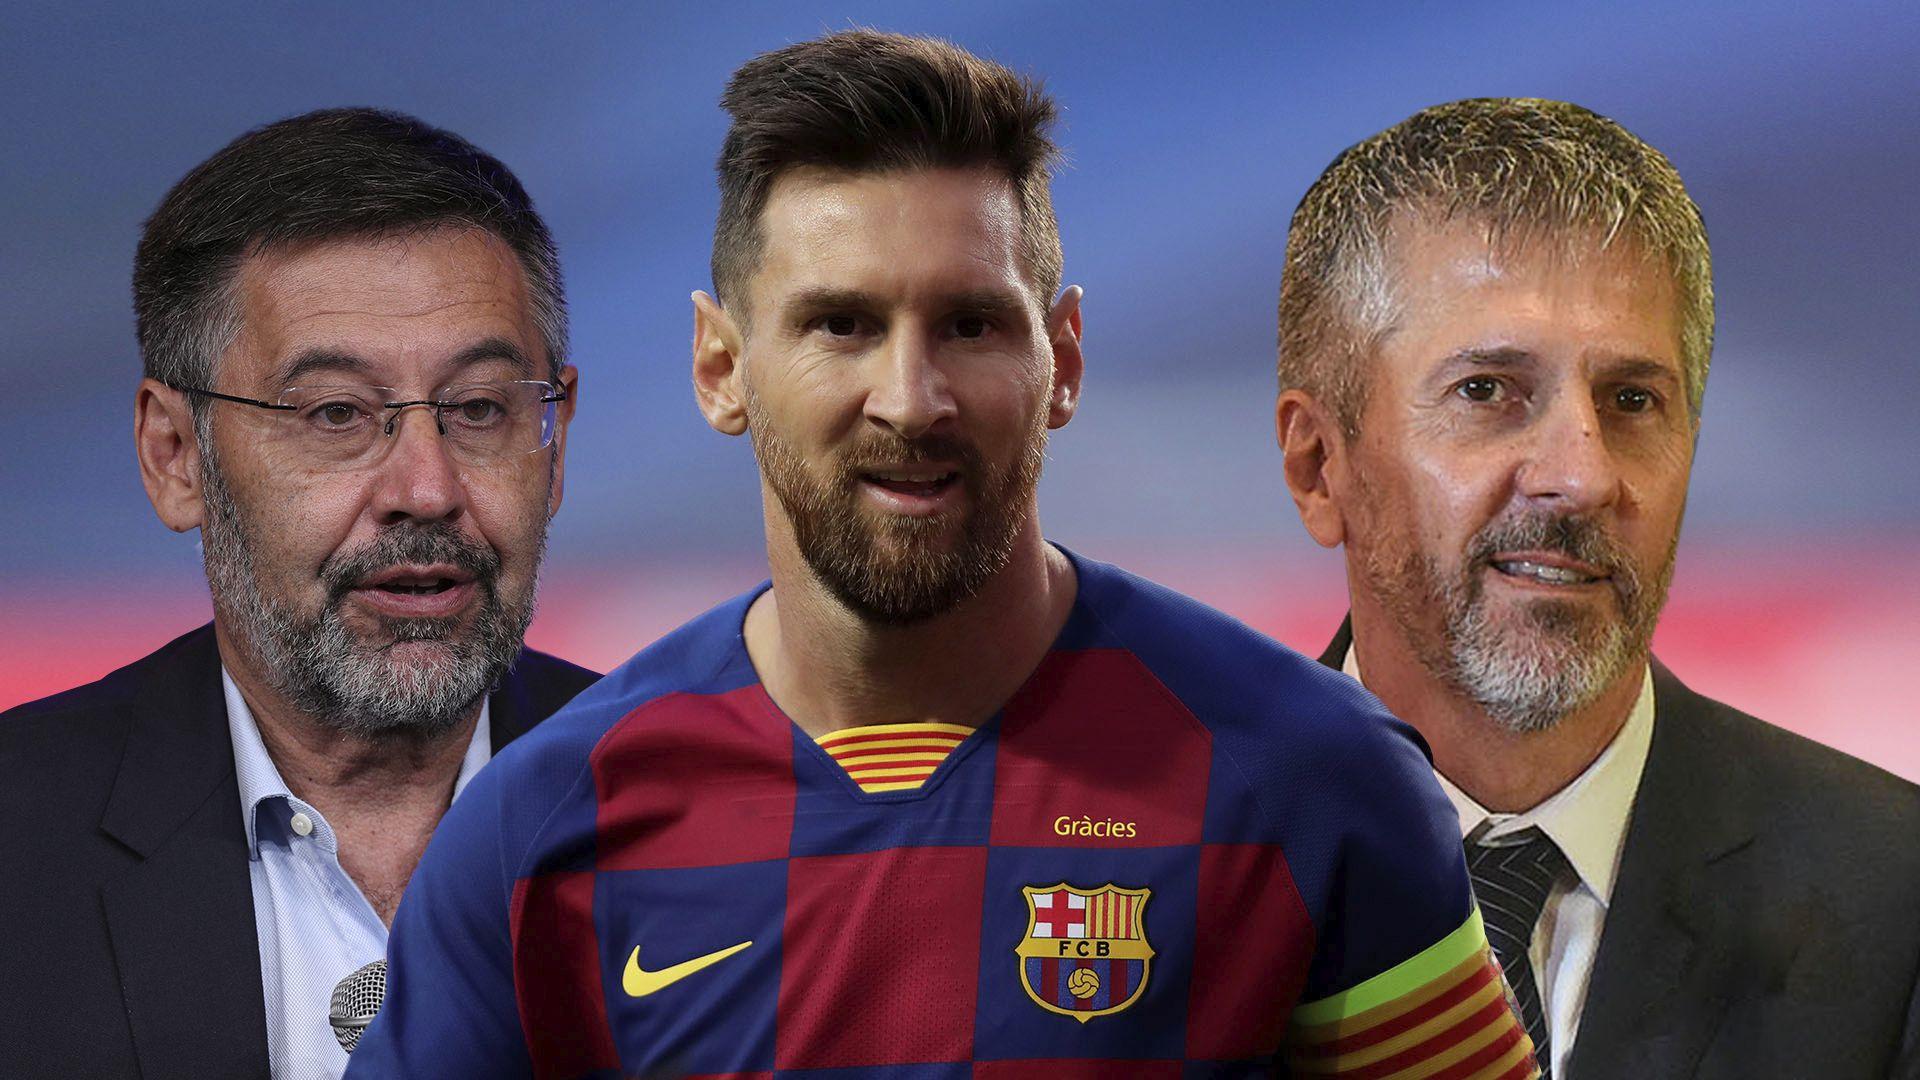 Josep Bartomeu - Lio Messi - Jorge Messi